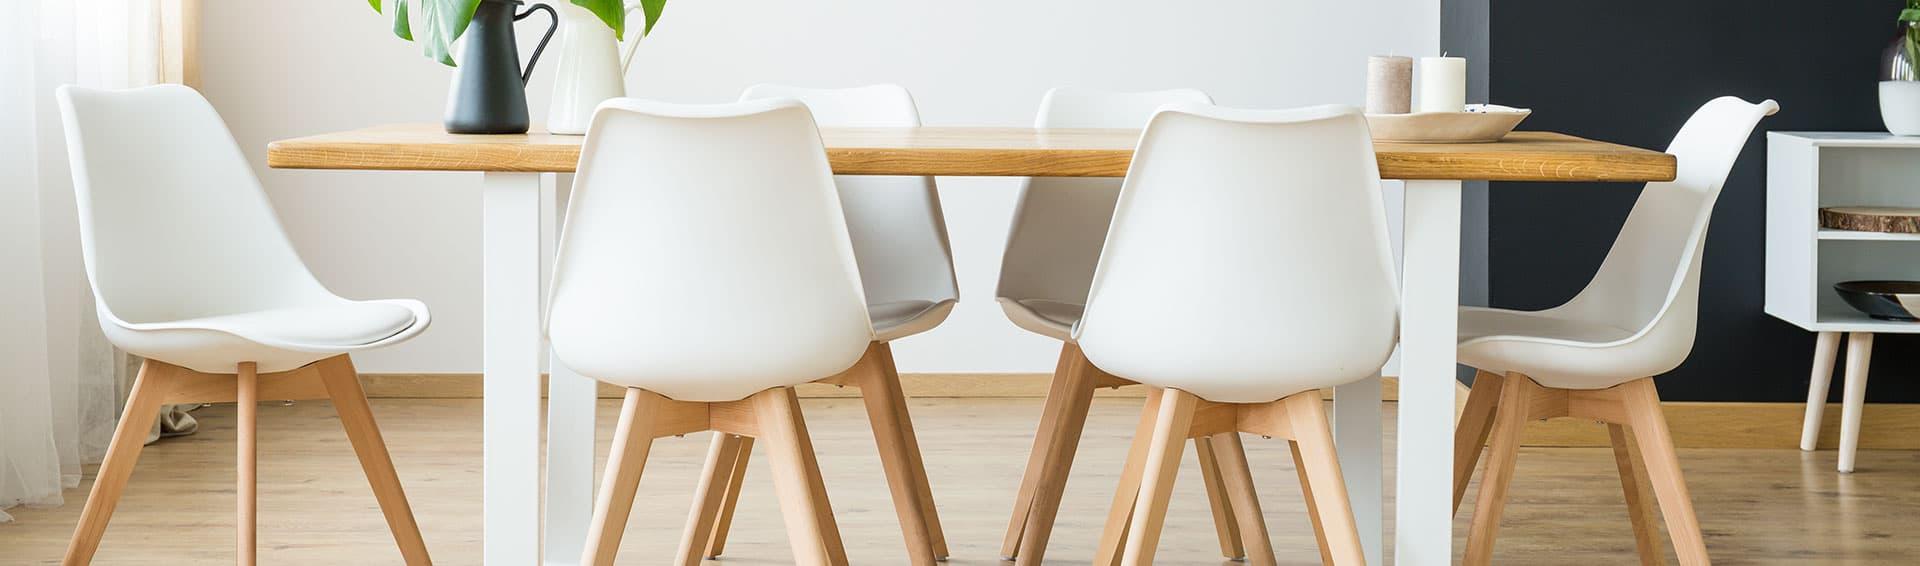 marri-timber-furniture-01